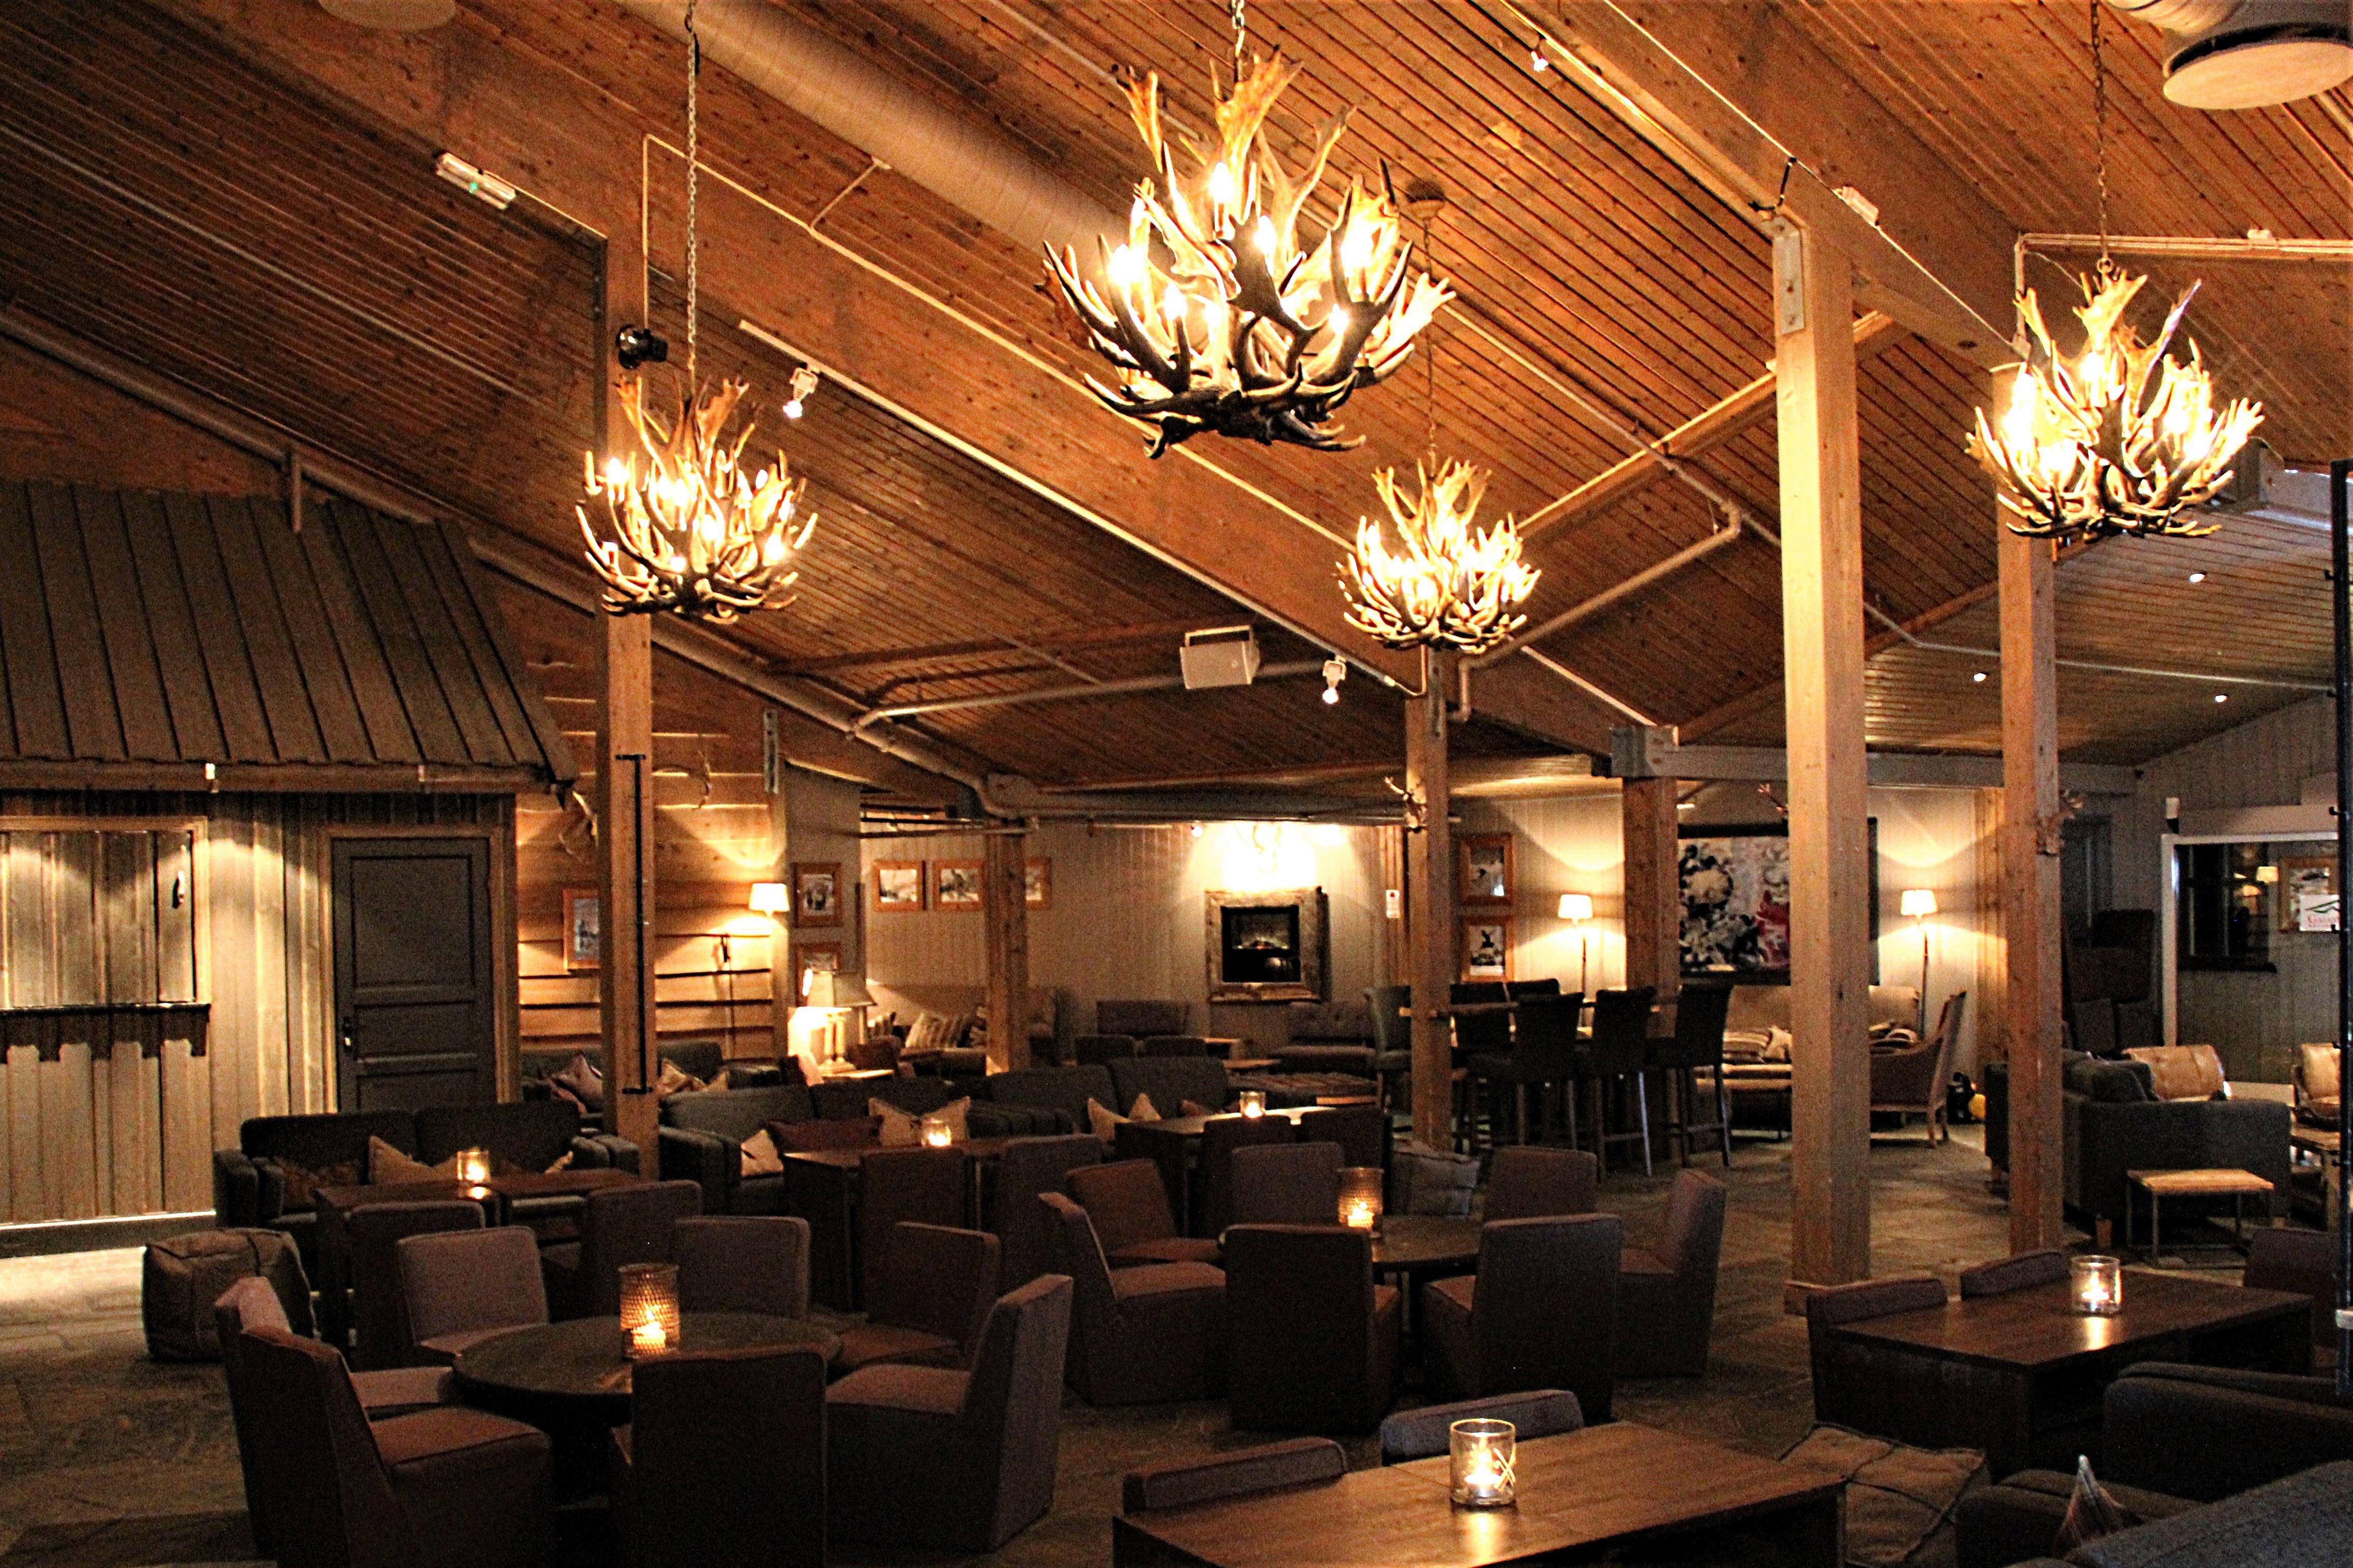 Restaurant at Gaiastova in Hafjell